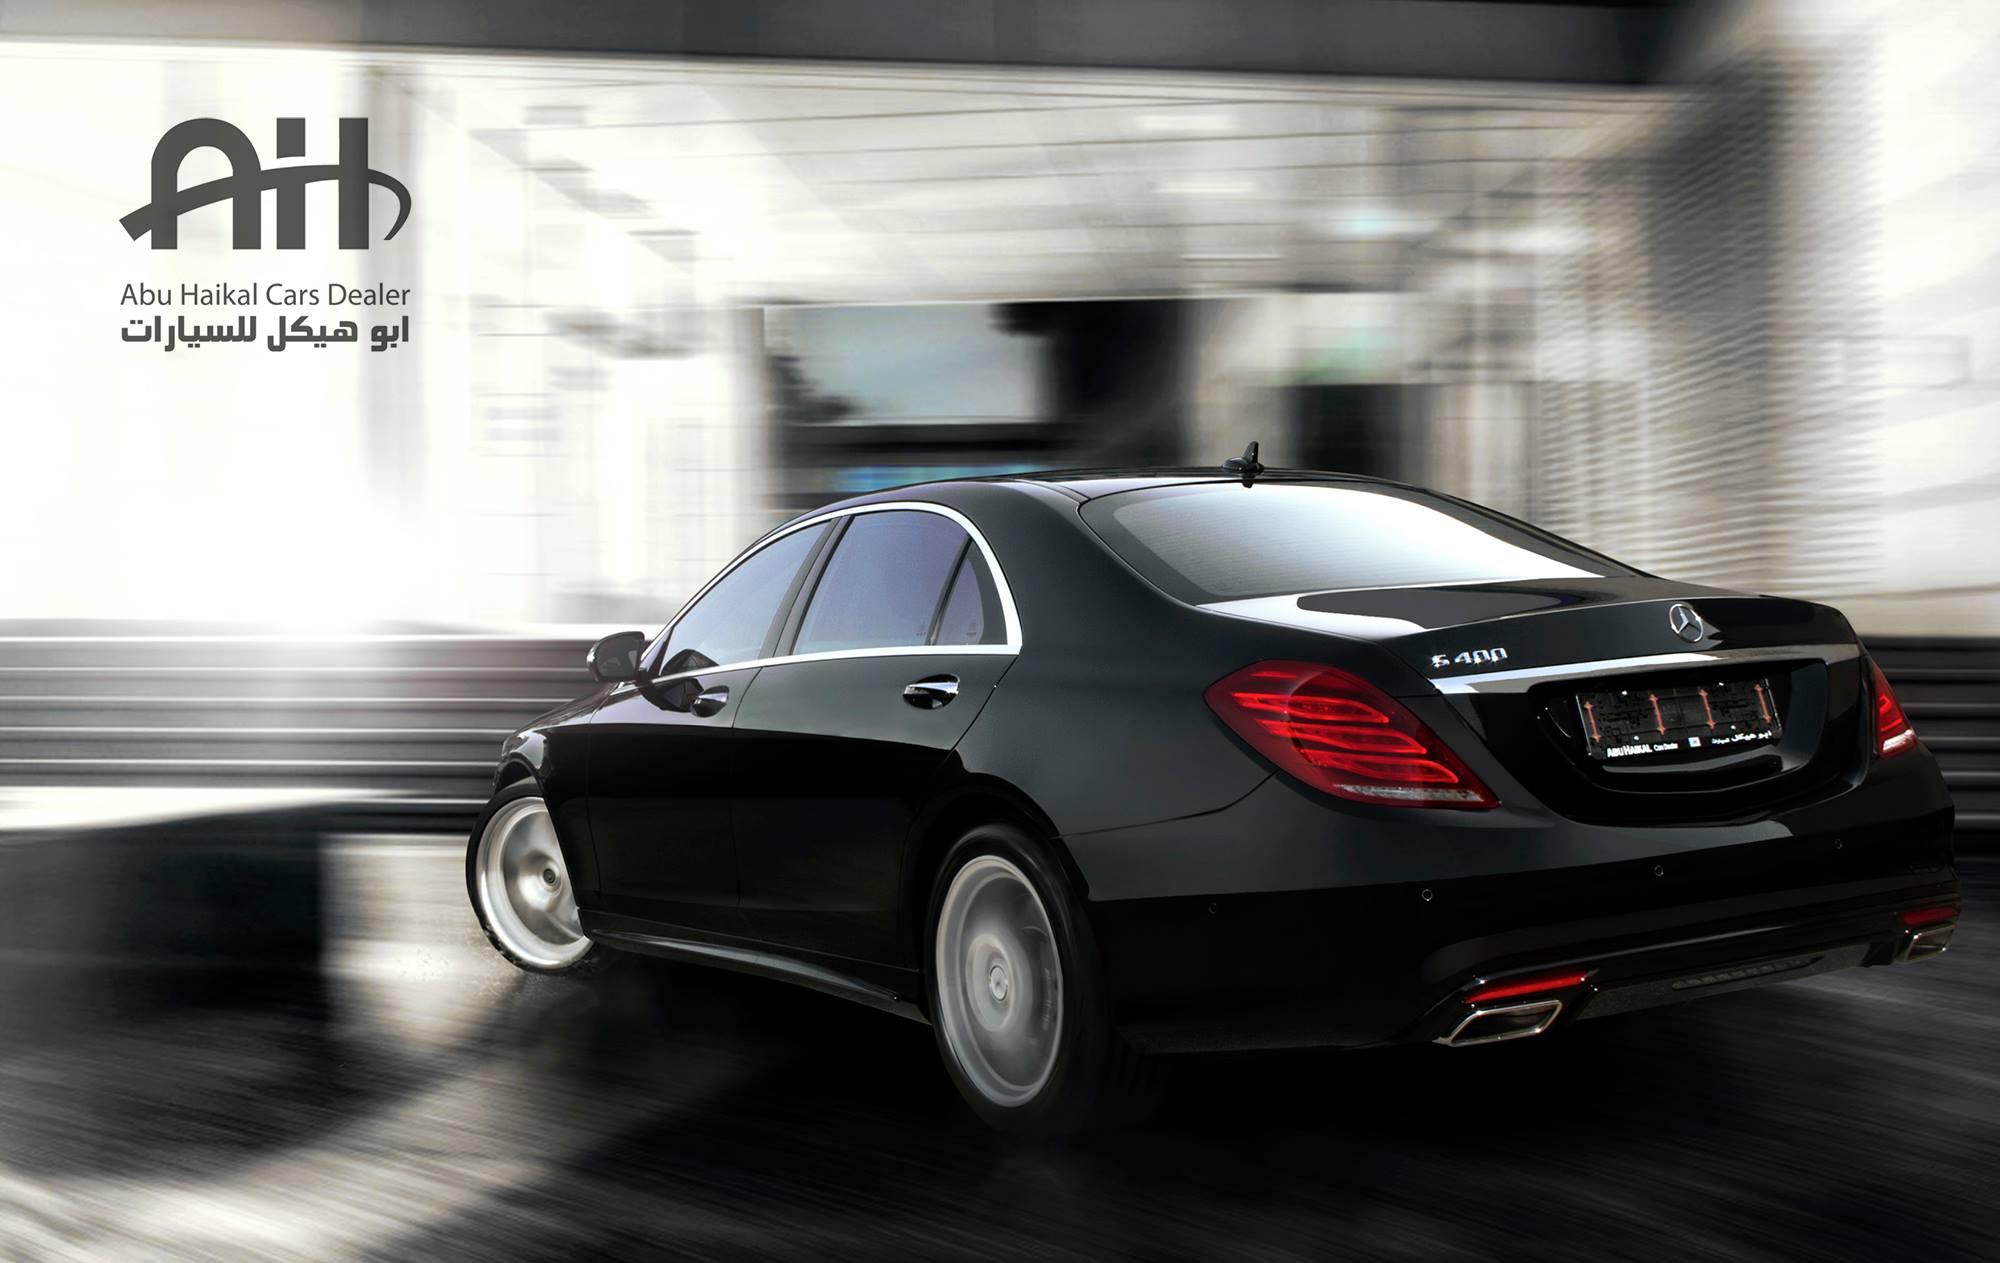 eb3dd65c5 Hala Bazaar | سيارات للبيع في الاردن - معرض أبو هيكل للسيارات